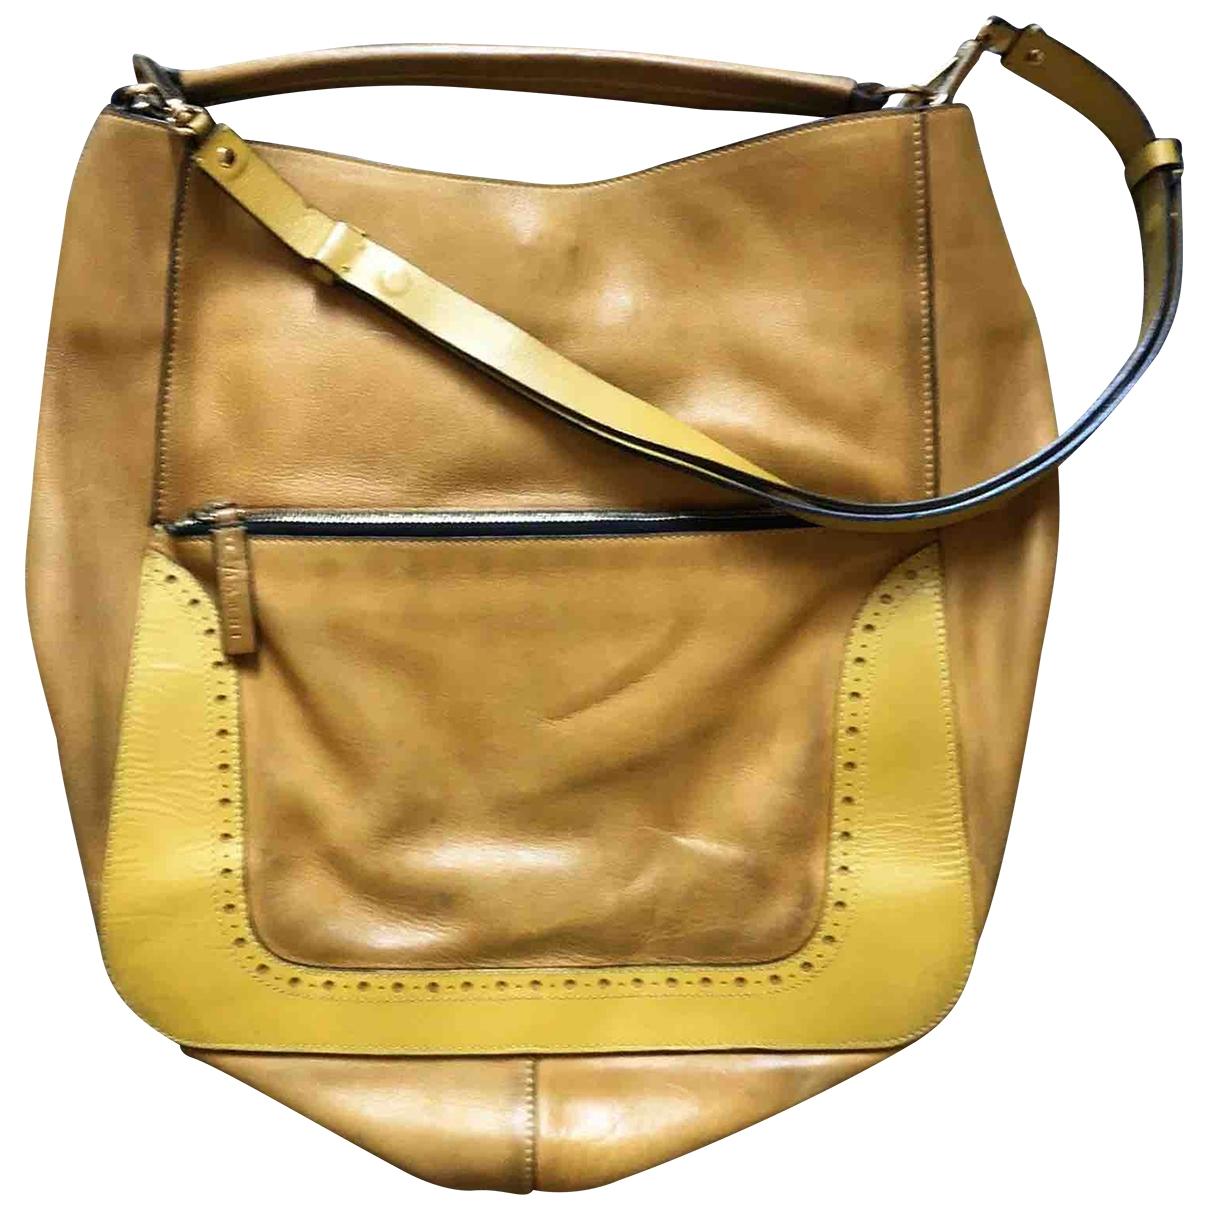 Marni \N Yellow Leather handbag for Women \N